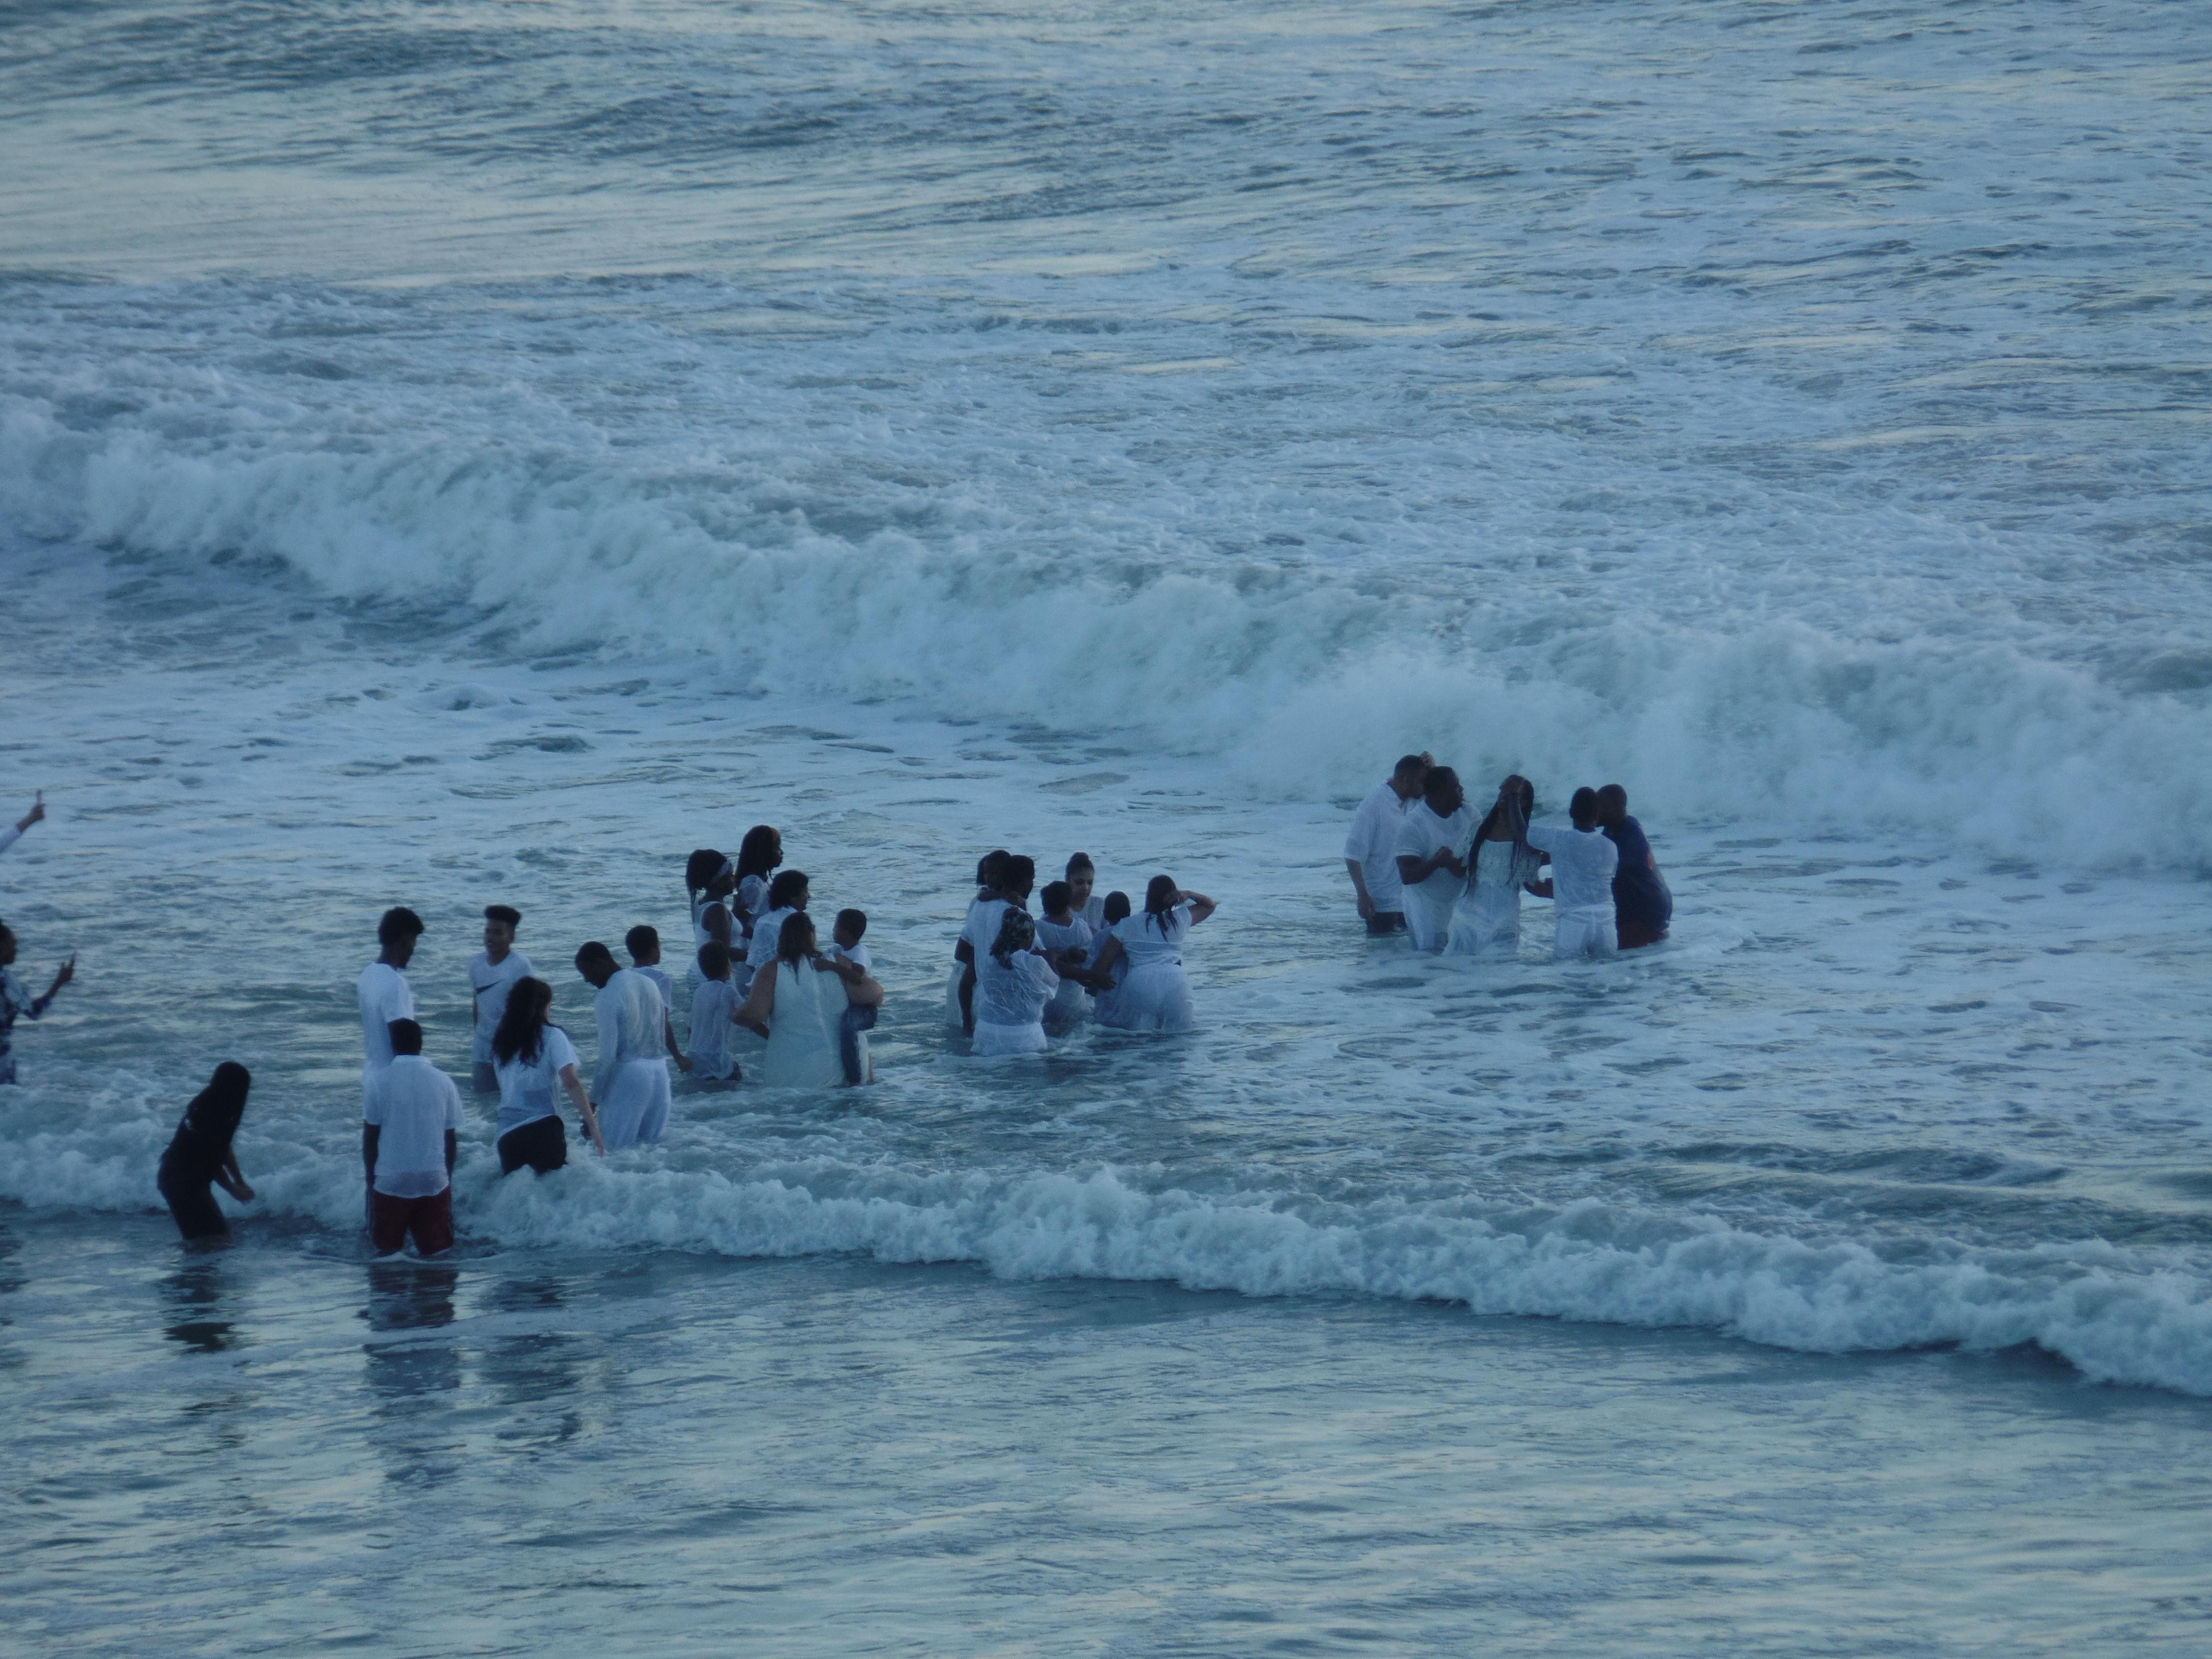 join the summer beach fun at New Smyrna Beach watching surf baptism